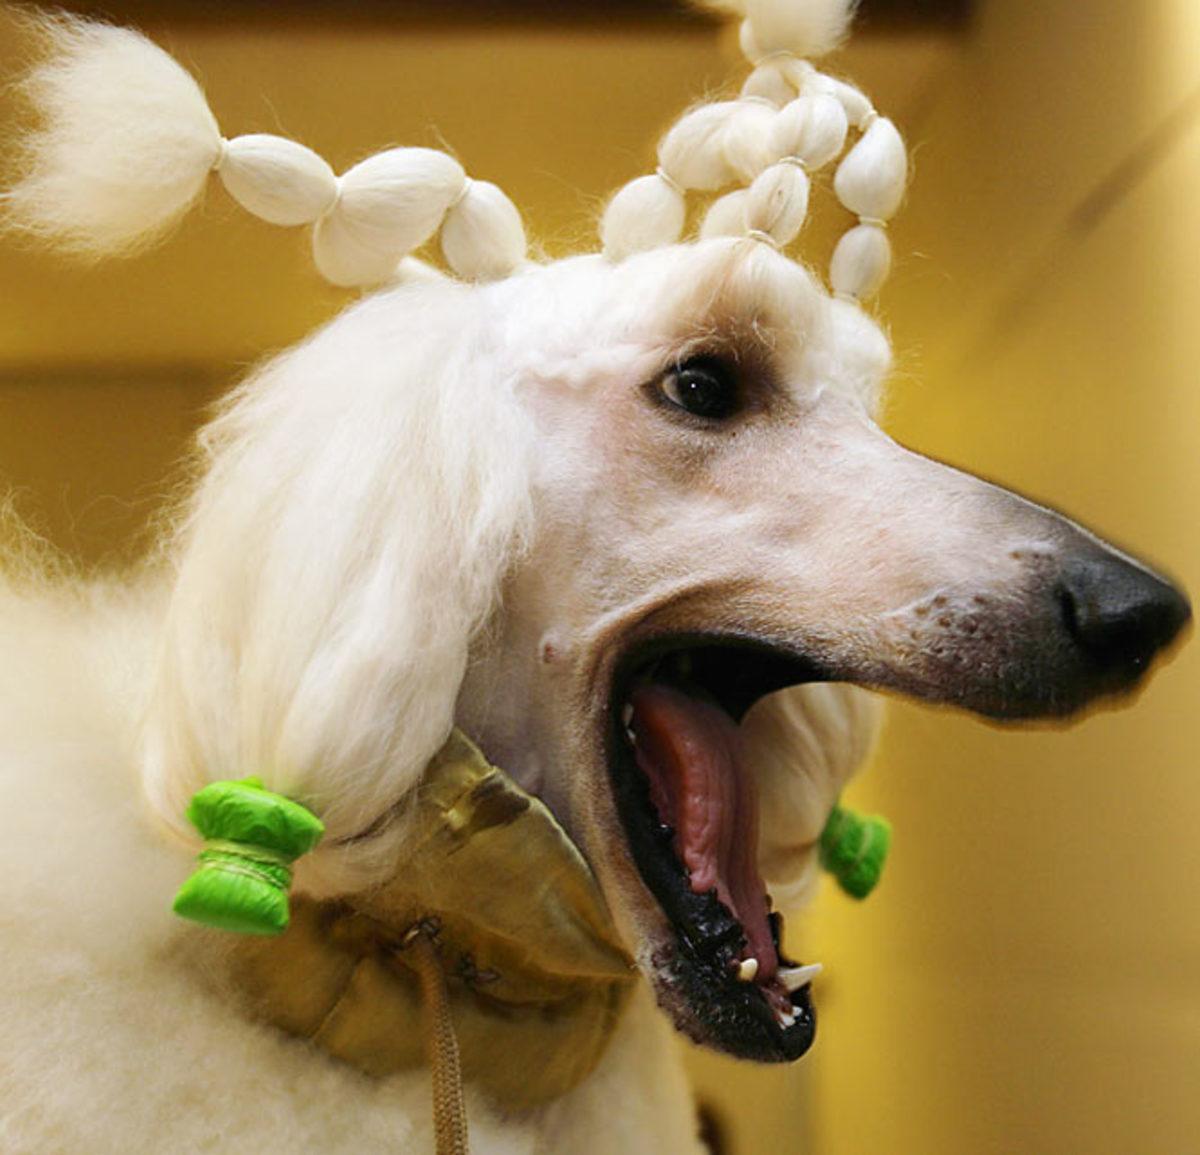 Bert, a Standard Poodle